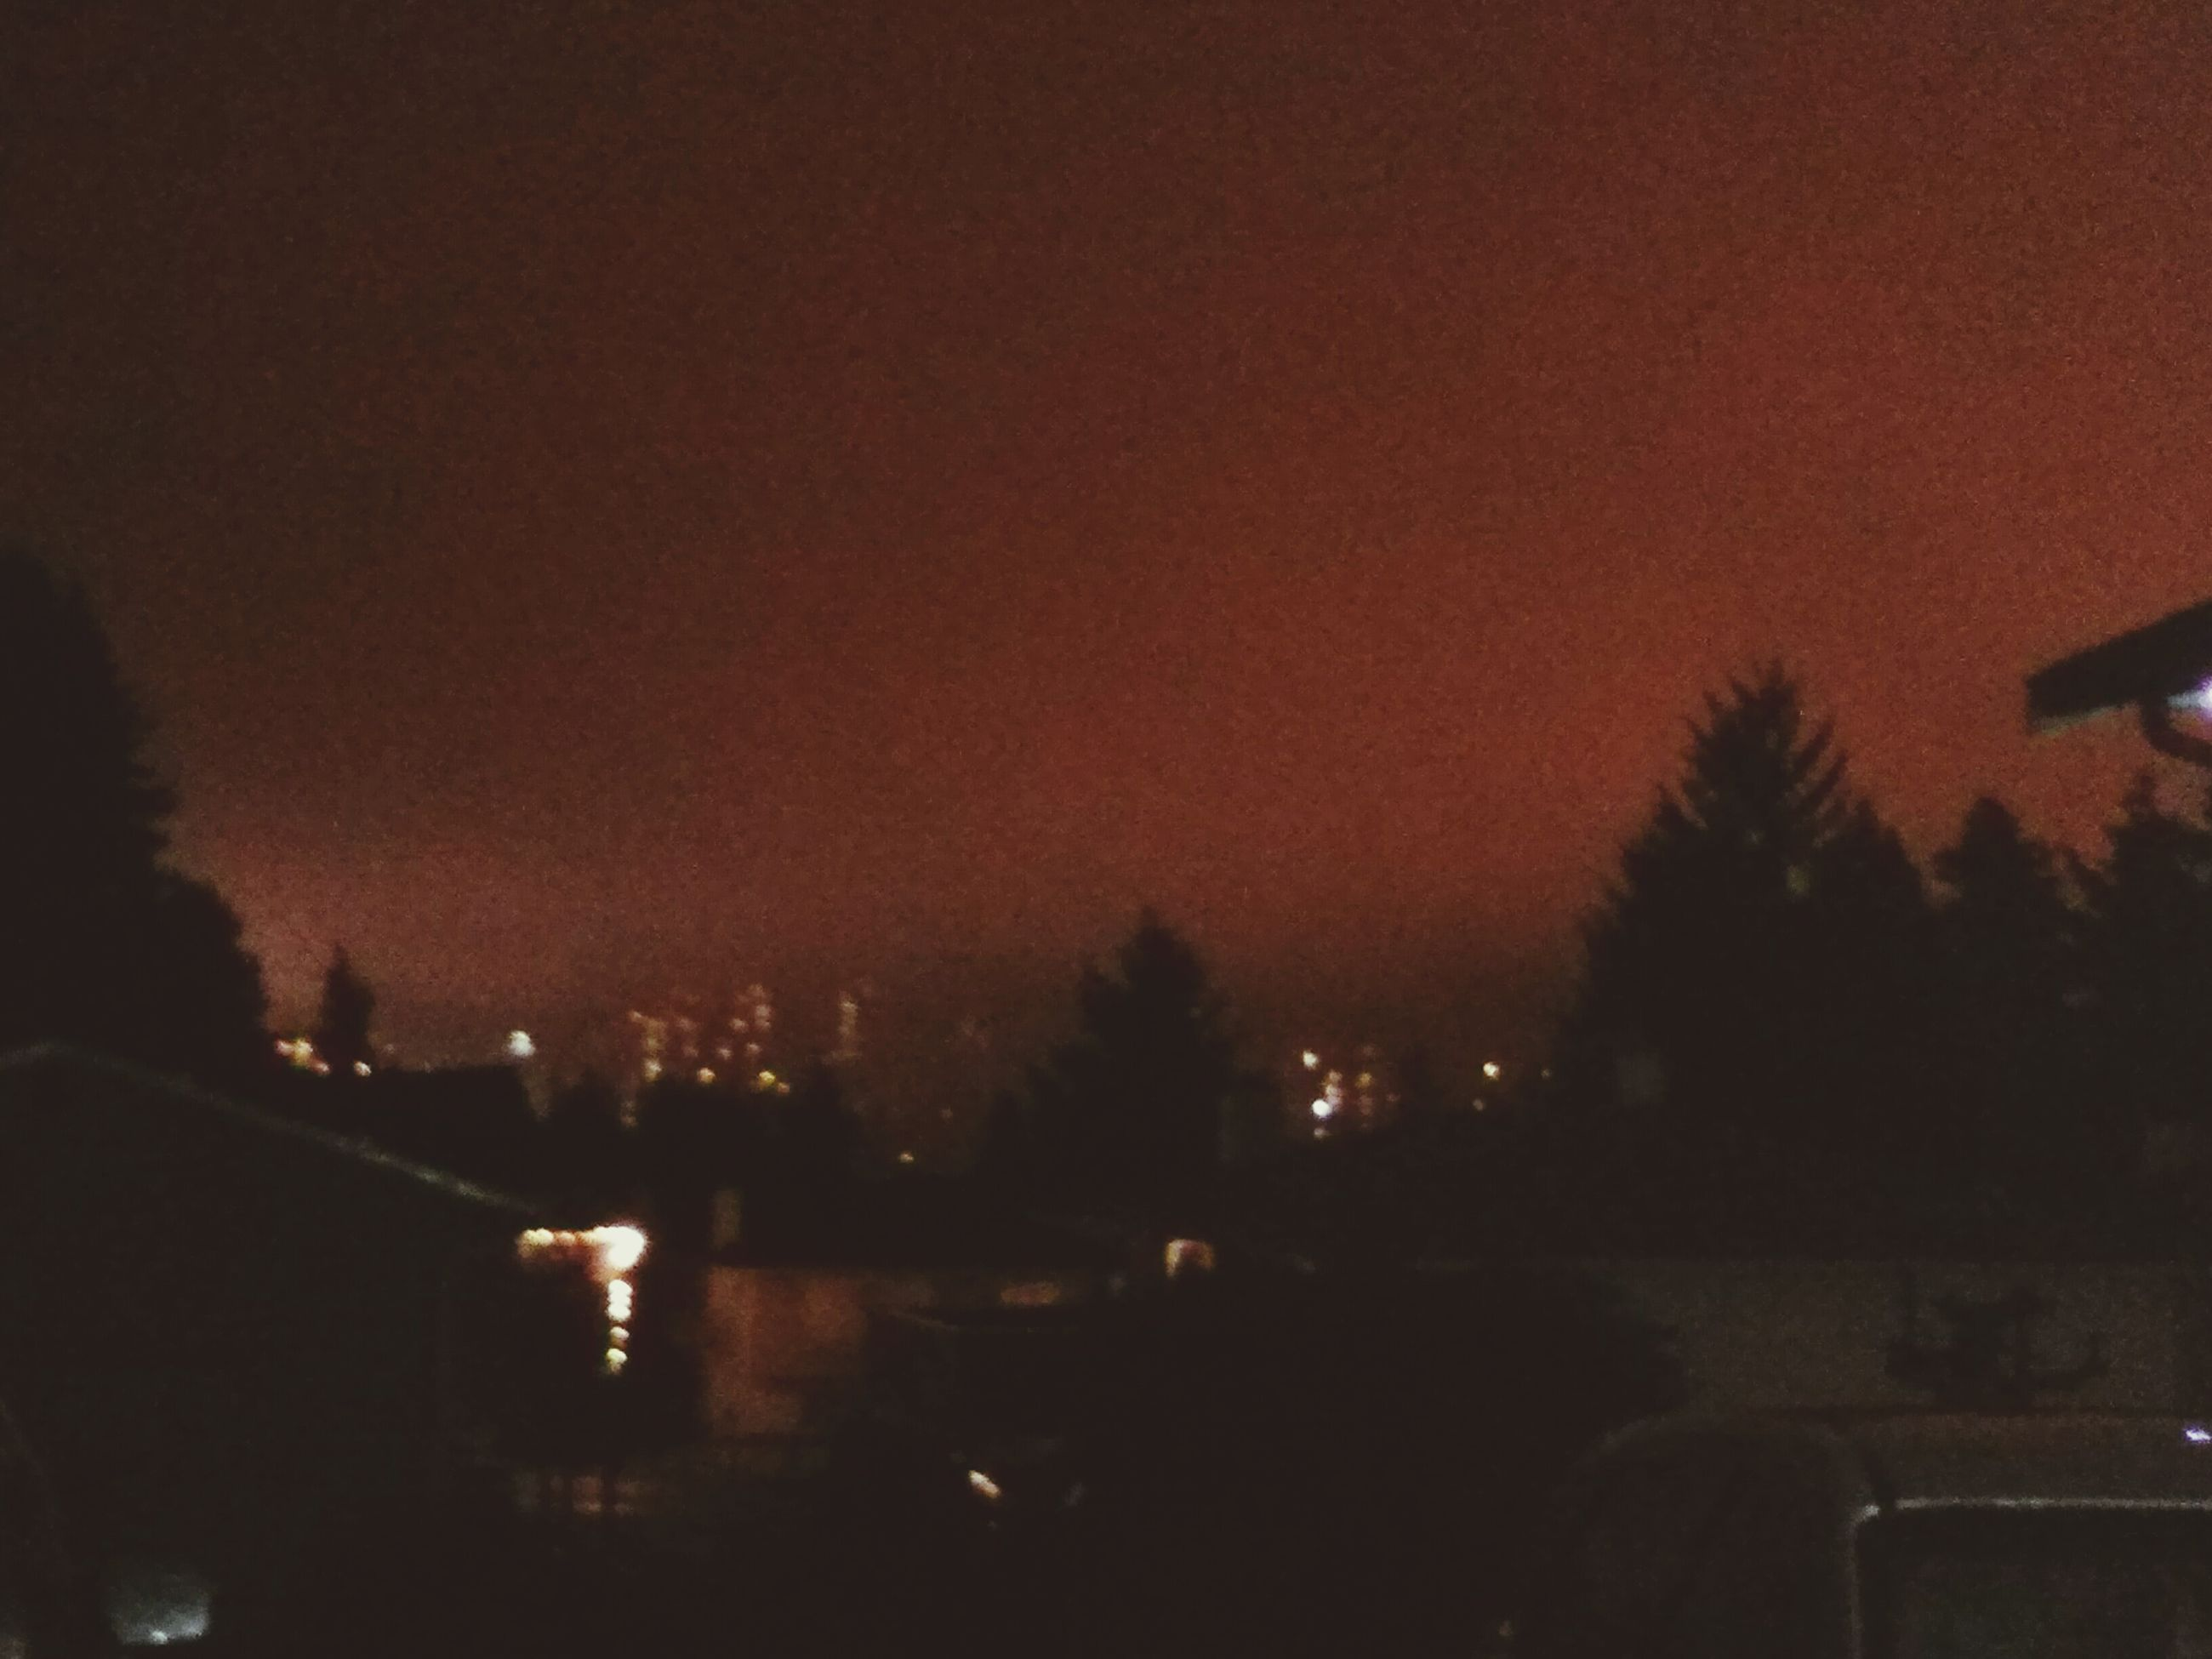 illuminated, sunset, silhouette, car, night, sky, transportation, land vehicle, dusk, building exterior, tree, mode of transport, street, street light, dark, city, built structure, road, architecture, outdoors